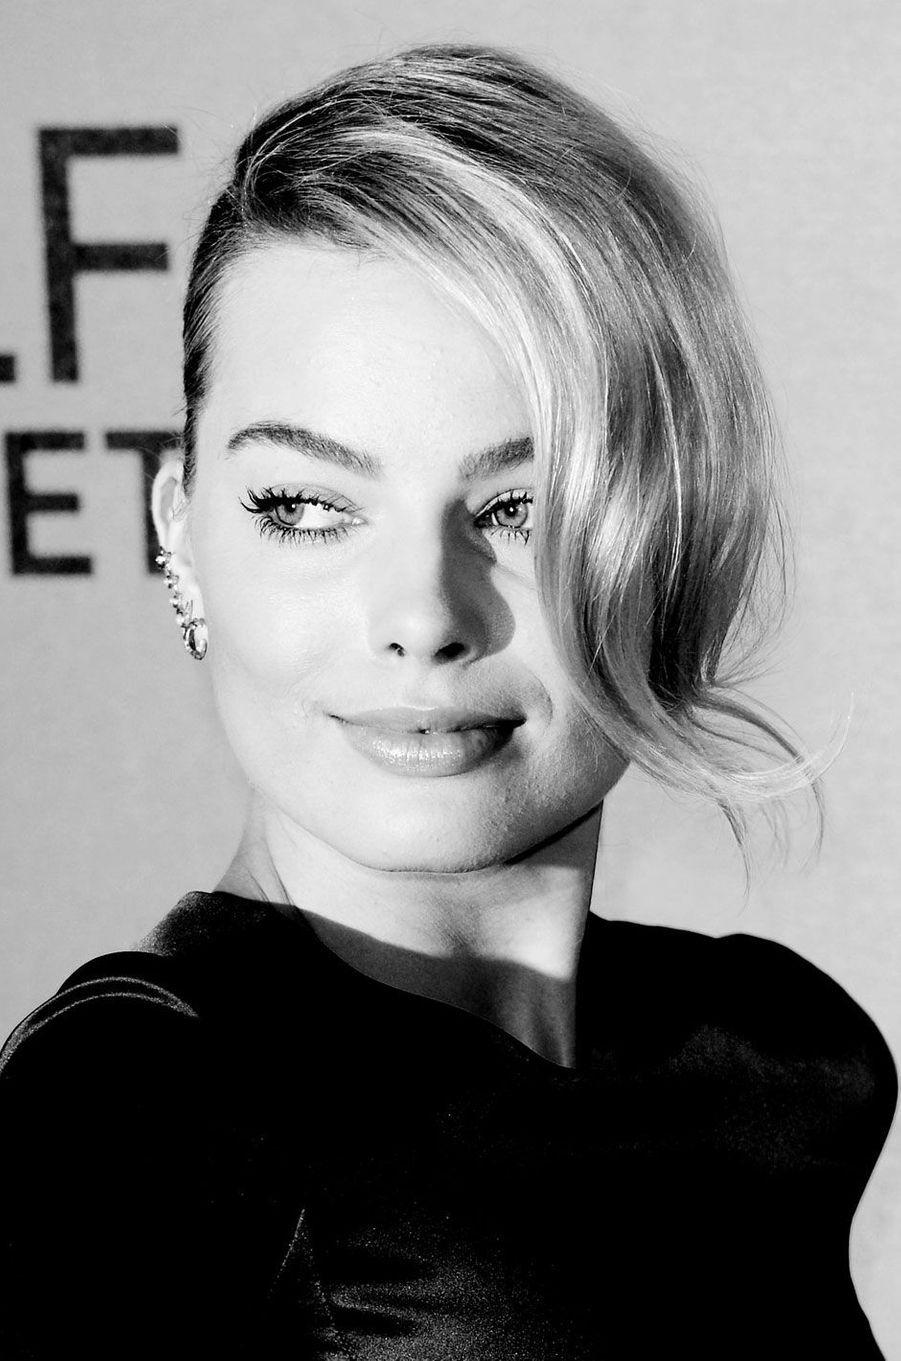 Margot Robbie à l'avant-première du Loup de Wall Street en janvier 2014